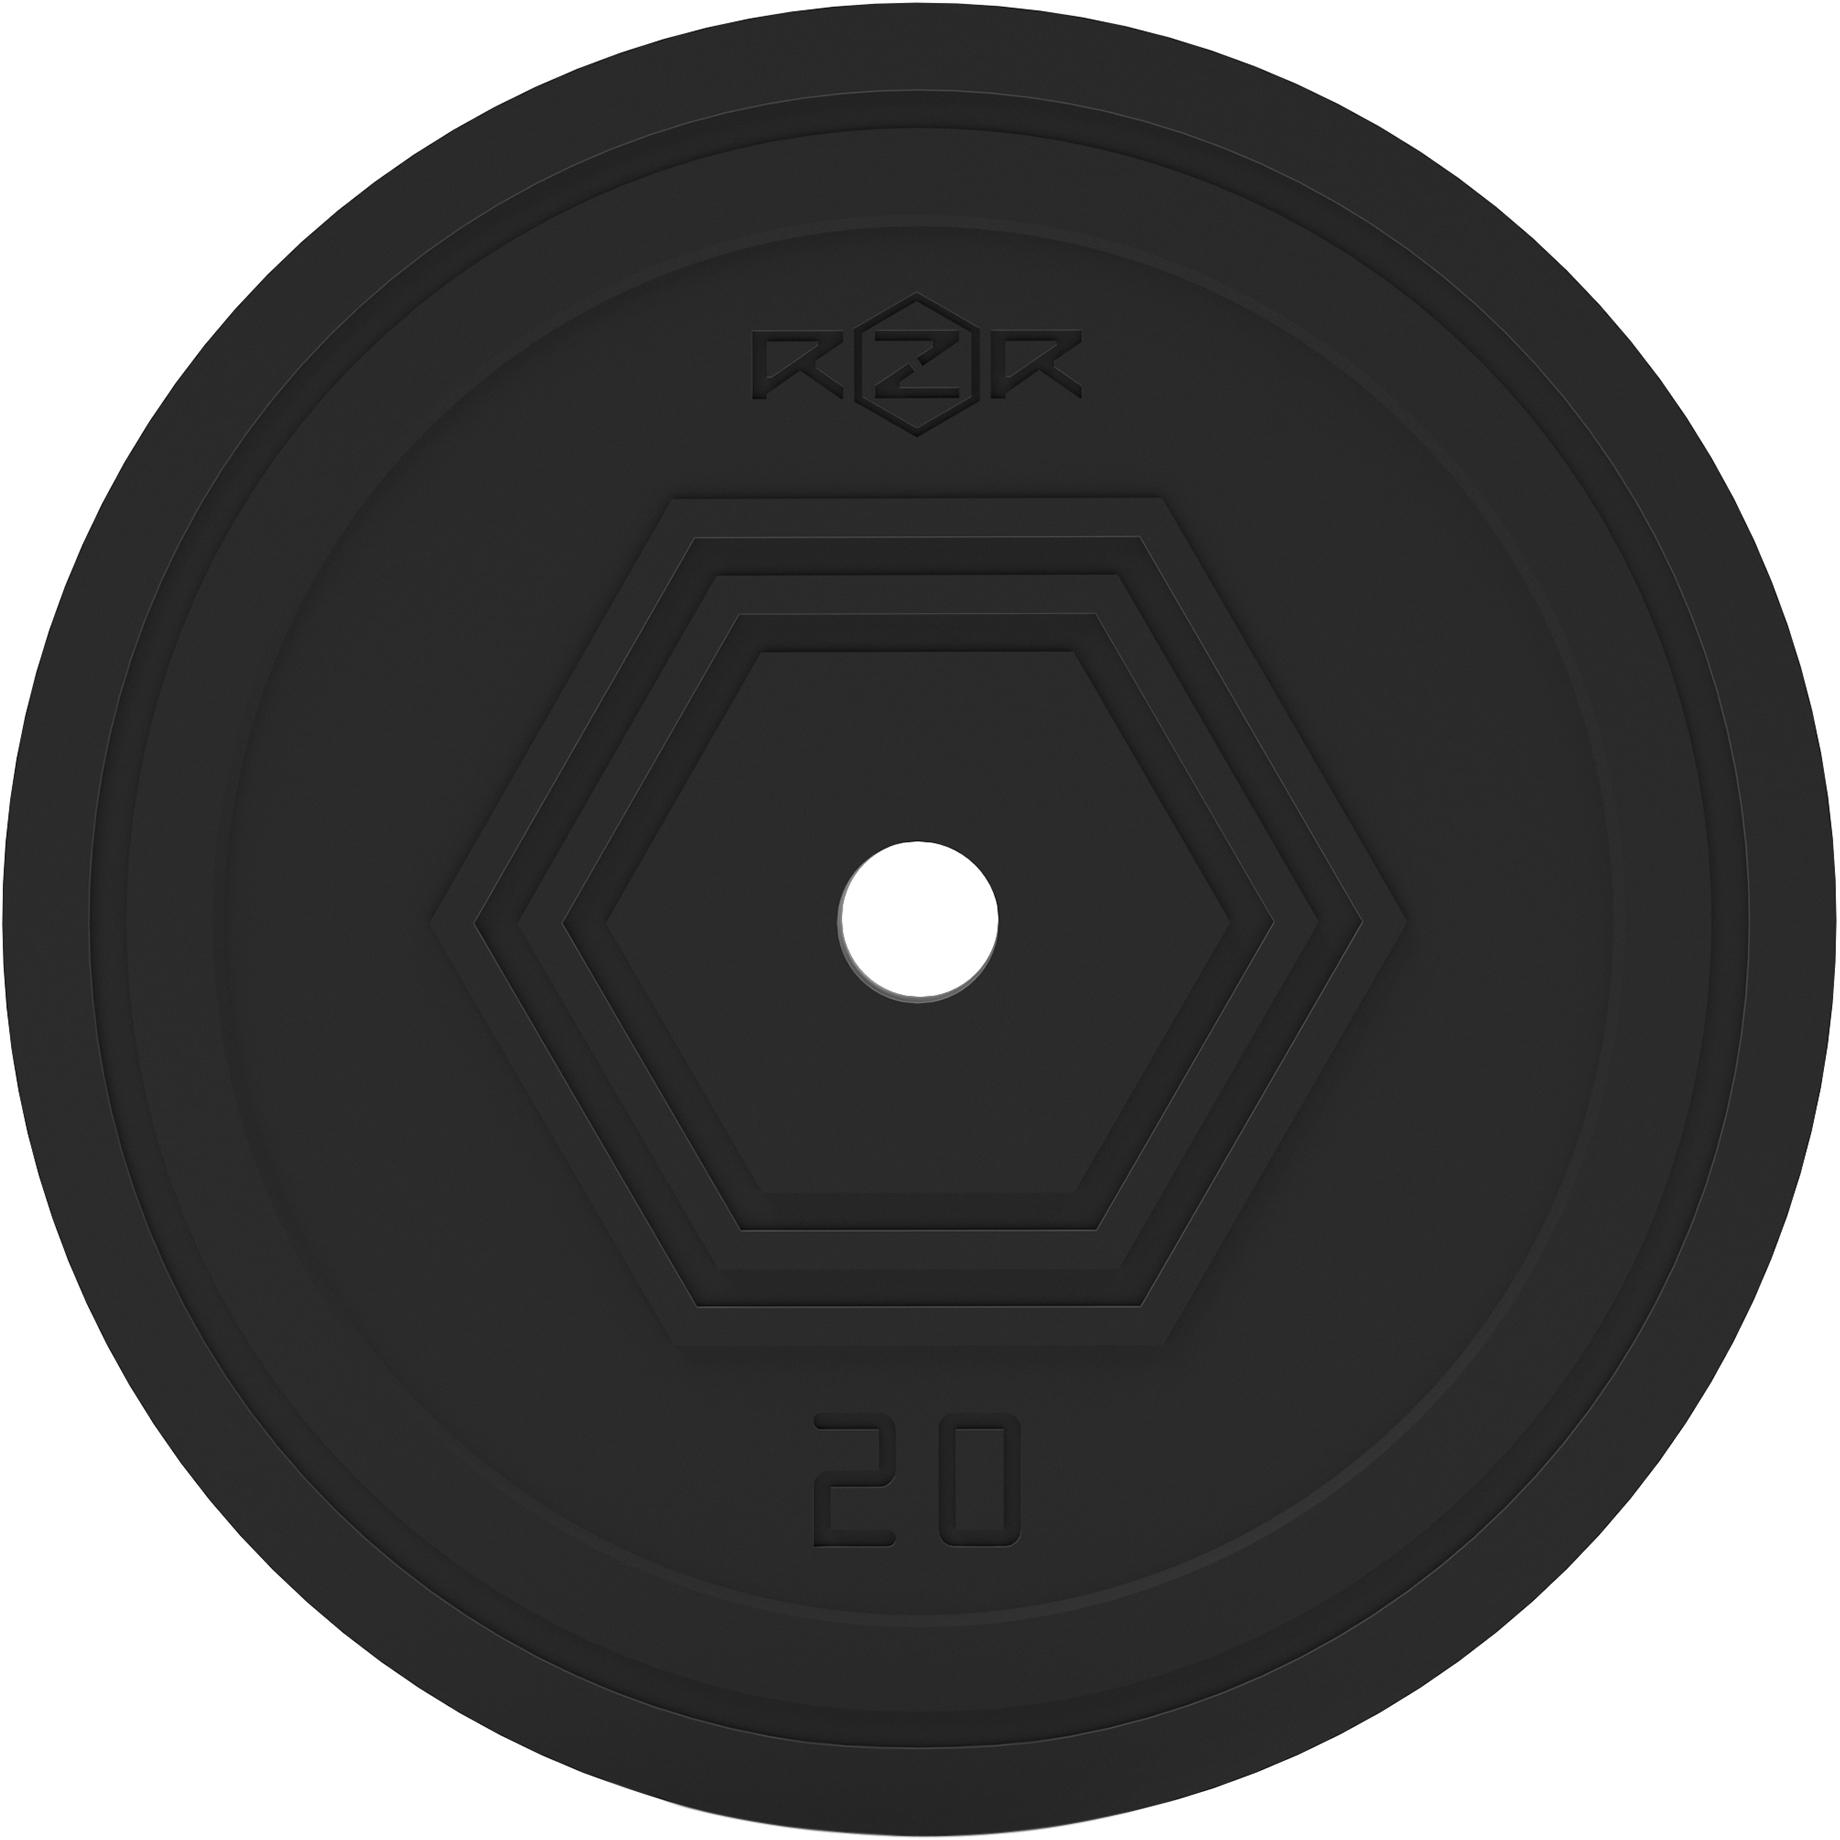 RZR Блин стальной обрезиненный, 20 кг -R200 блин стальной torneo 20 кг d 30 мм 1022 200